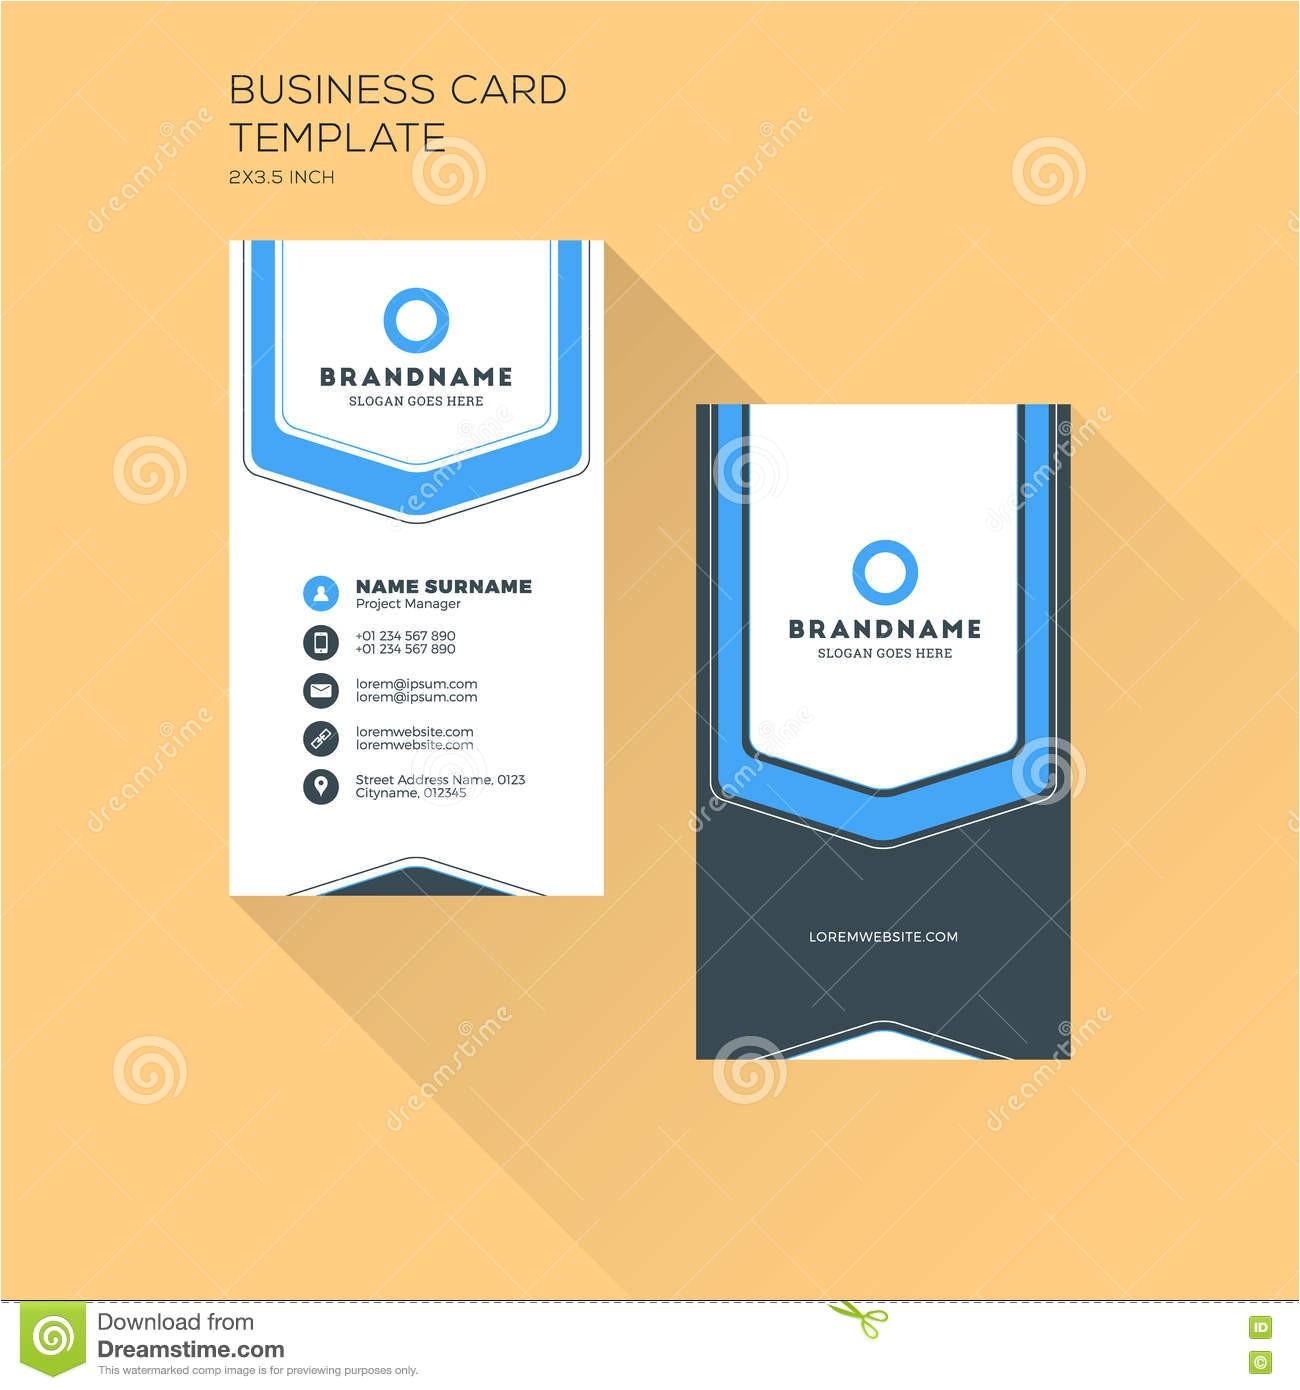 Avery Vertical Business Card Template Business Card Template Horizontal Gallery Card Design